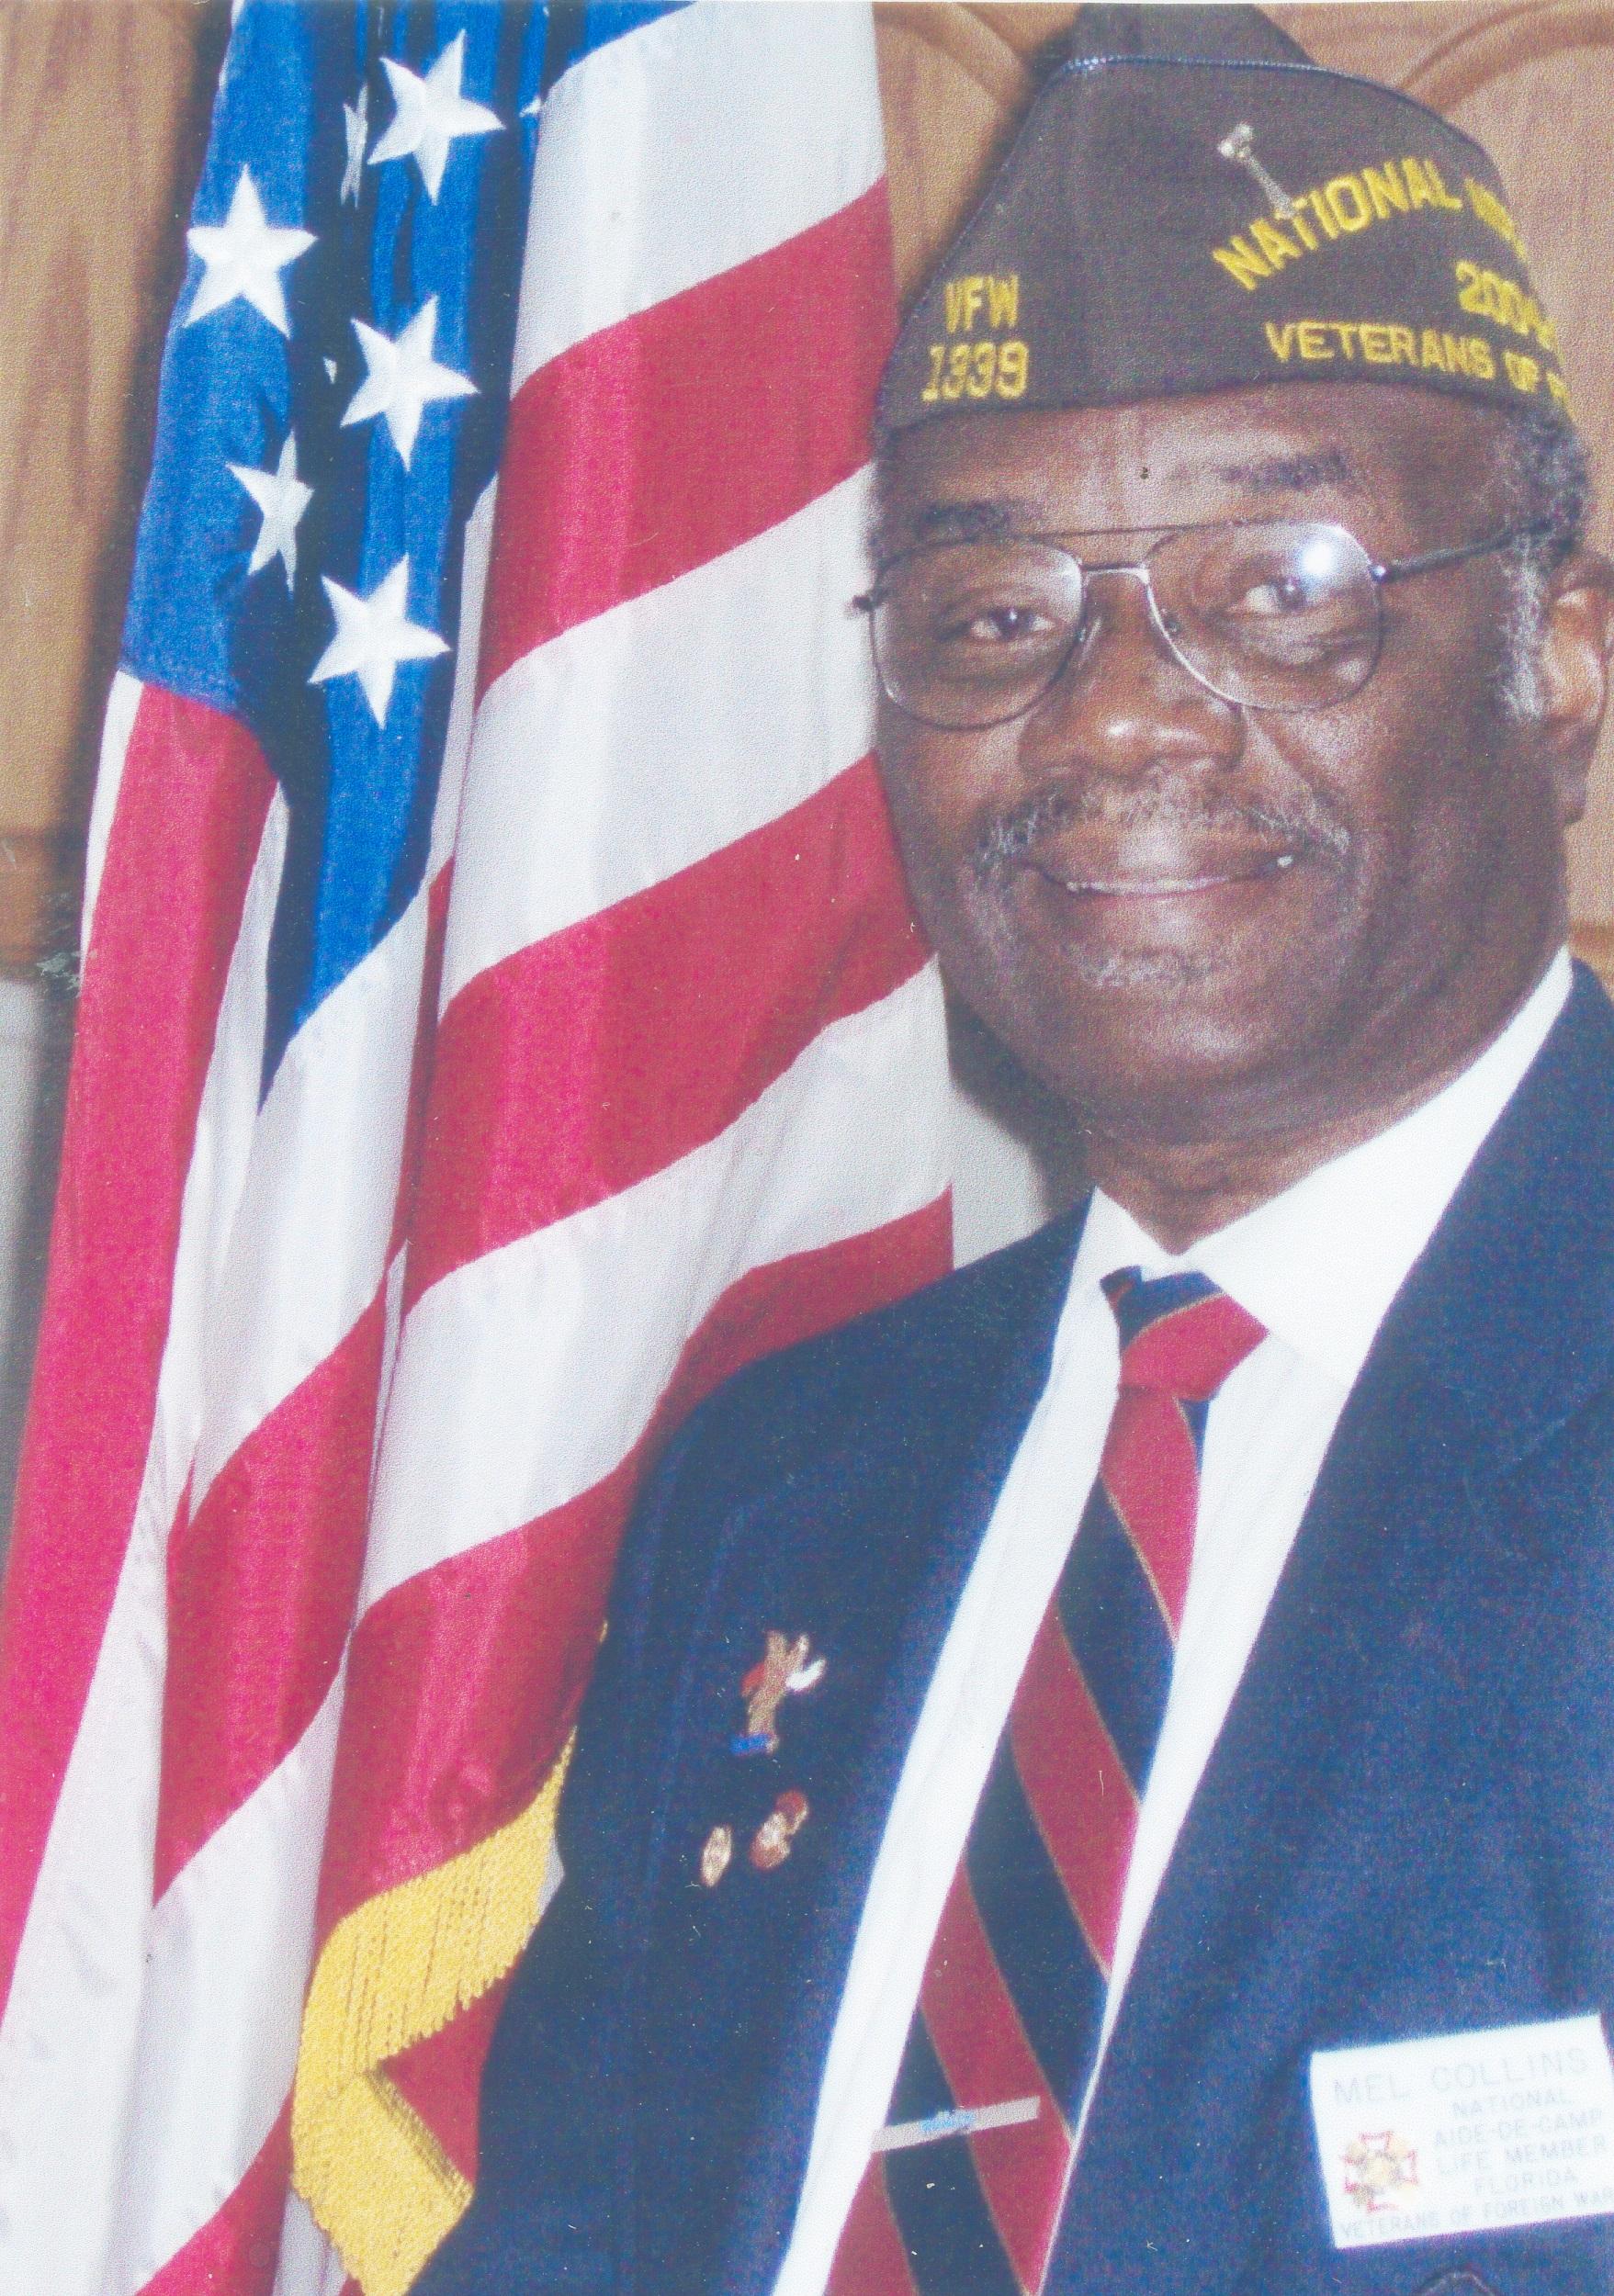 Commander Melvin Collins